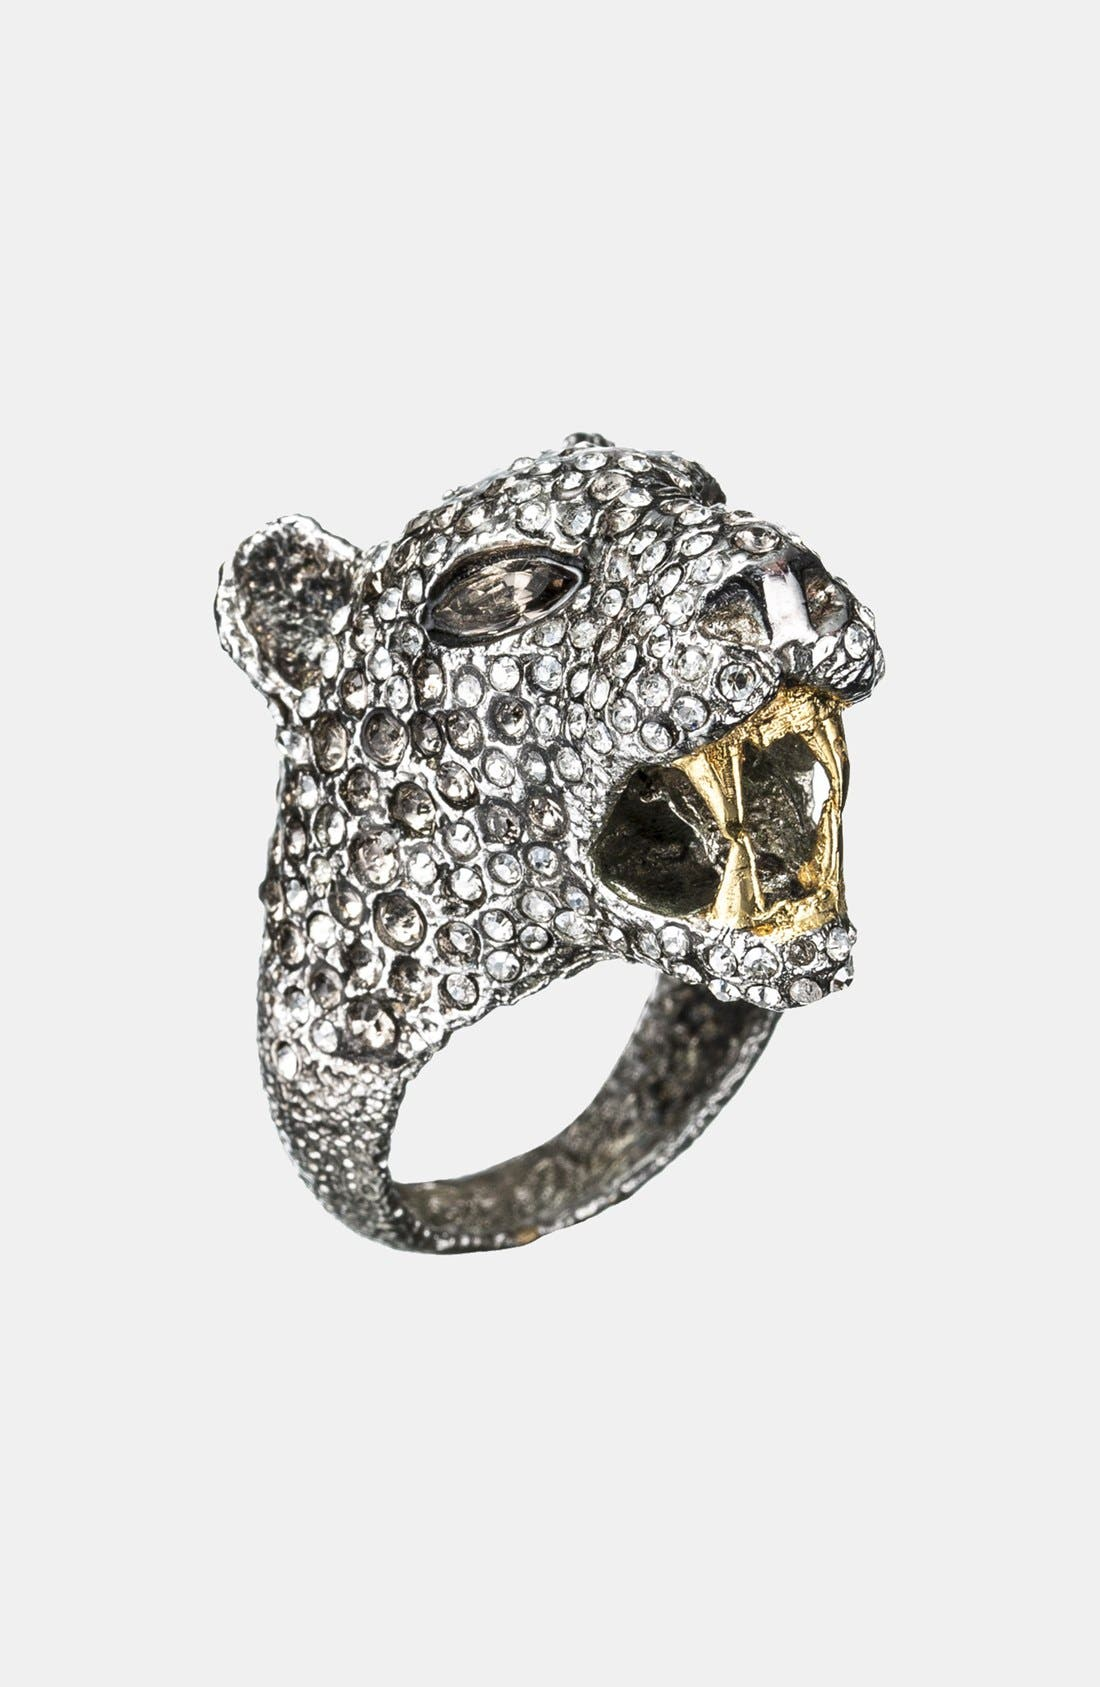 Alternate Image 1 Selected - Alexis Bittar 'Elements - Cordova' Jaguar Cocktail Ring